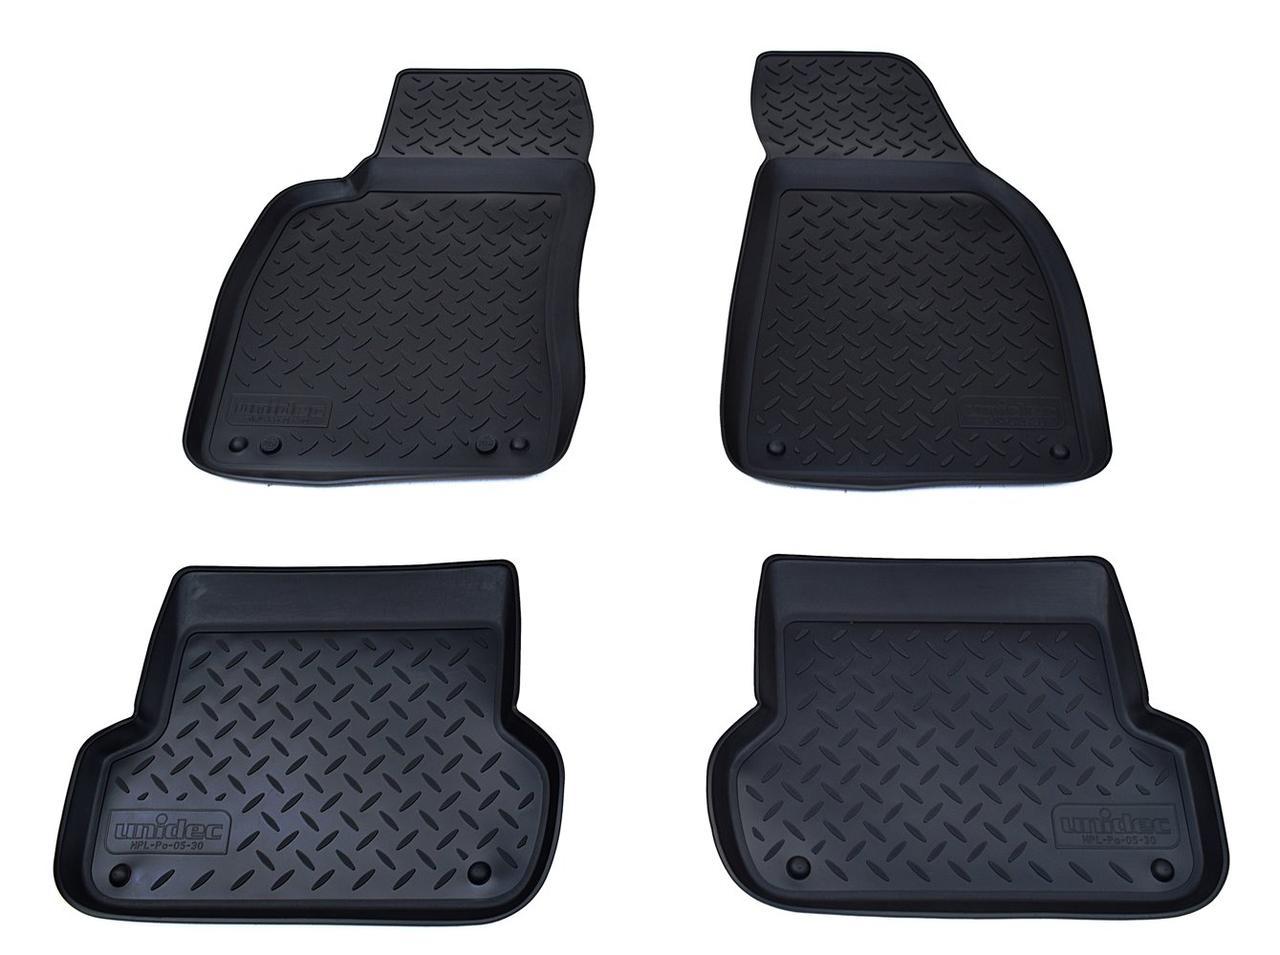 Коврики в салон для Audi A4 (B6,8E/B7,8E) (01-07) (полиур., компл - 4шт) NPL-Po-05-30